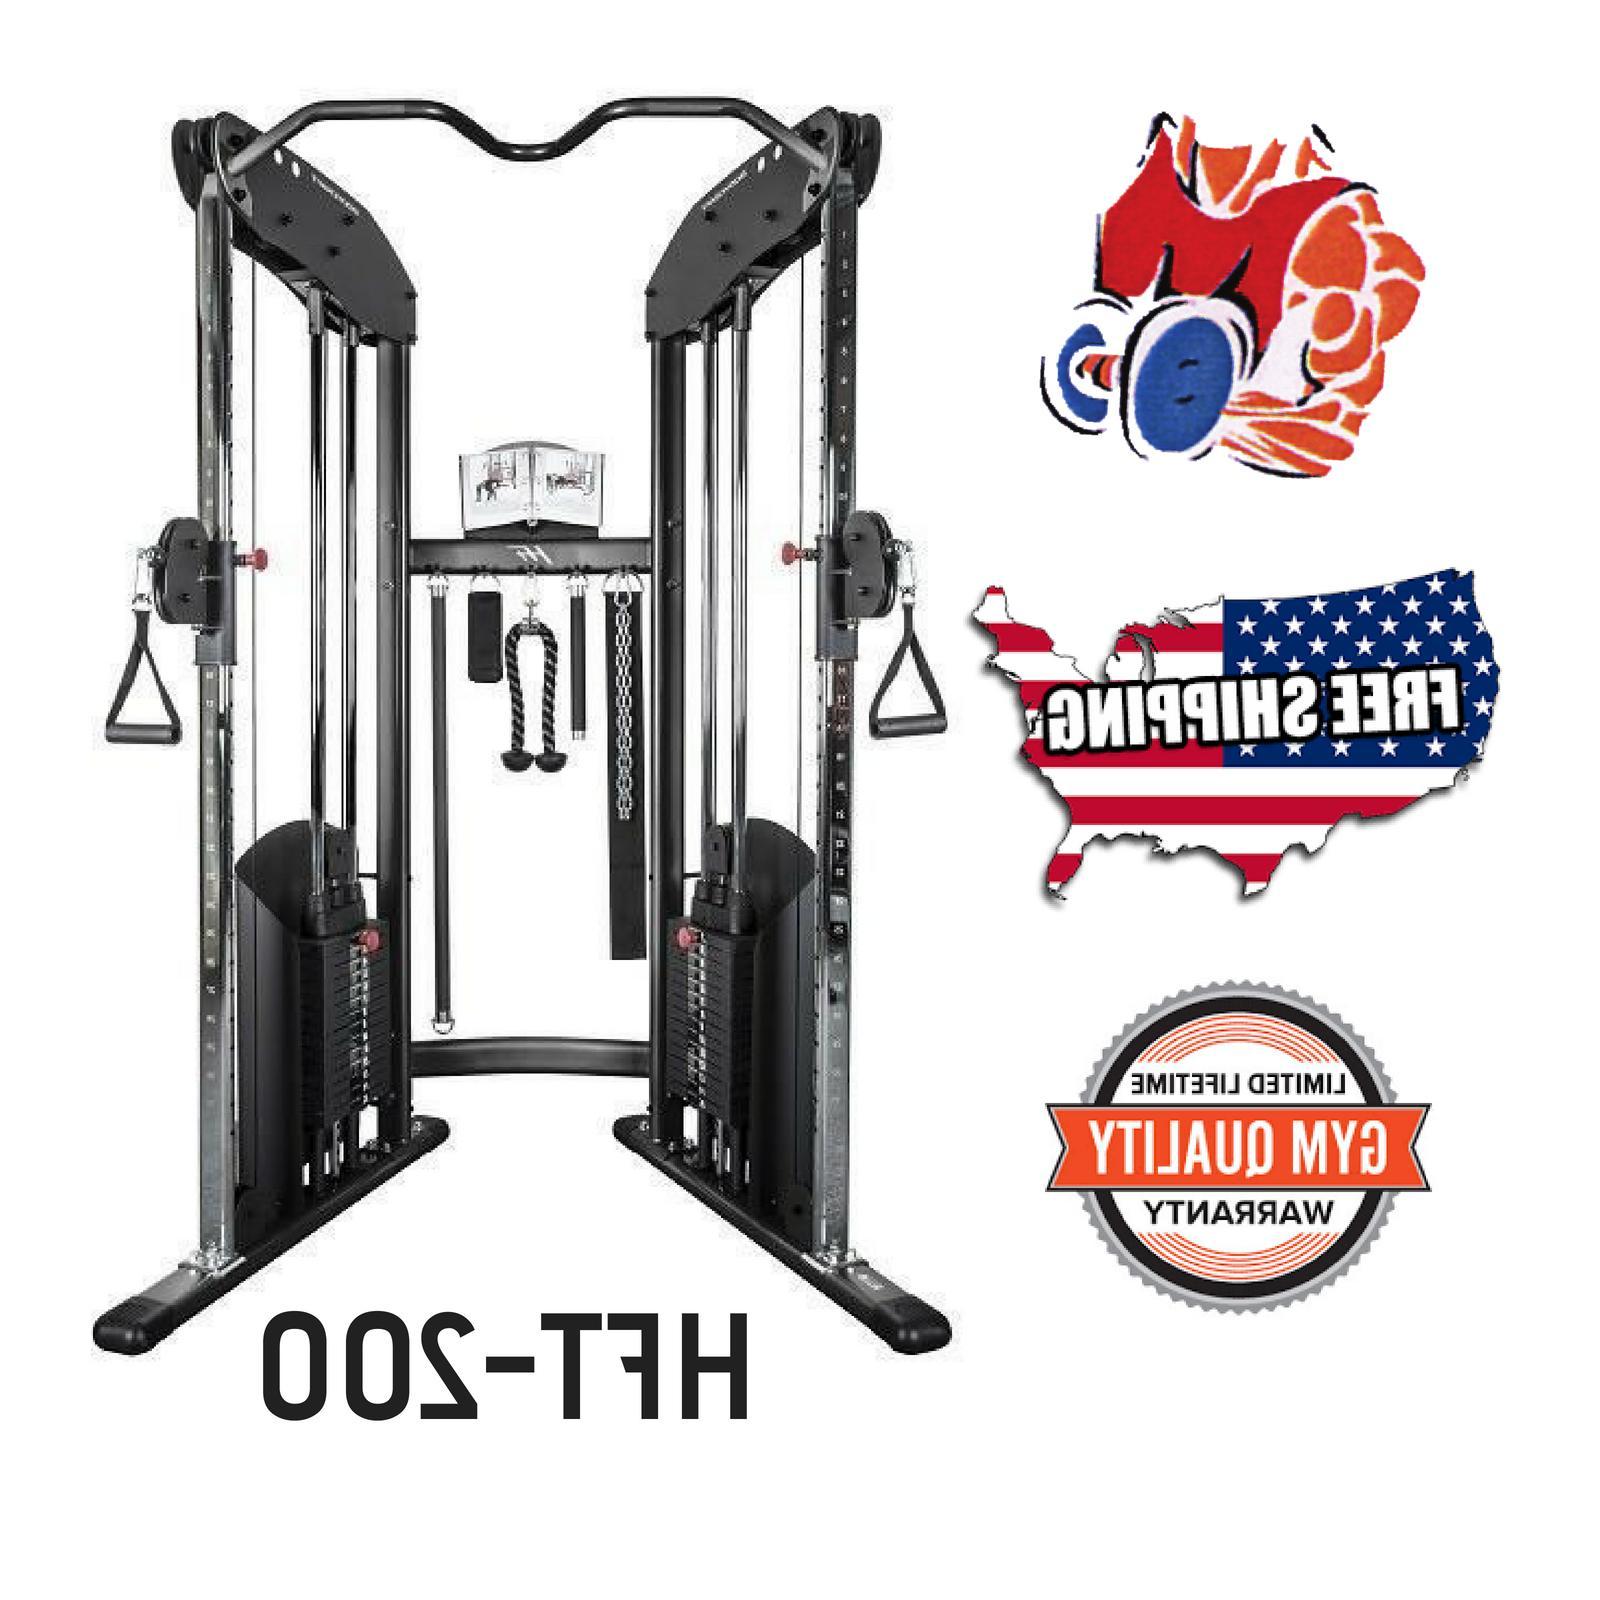 exercise fitness training machine for strength training